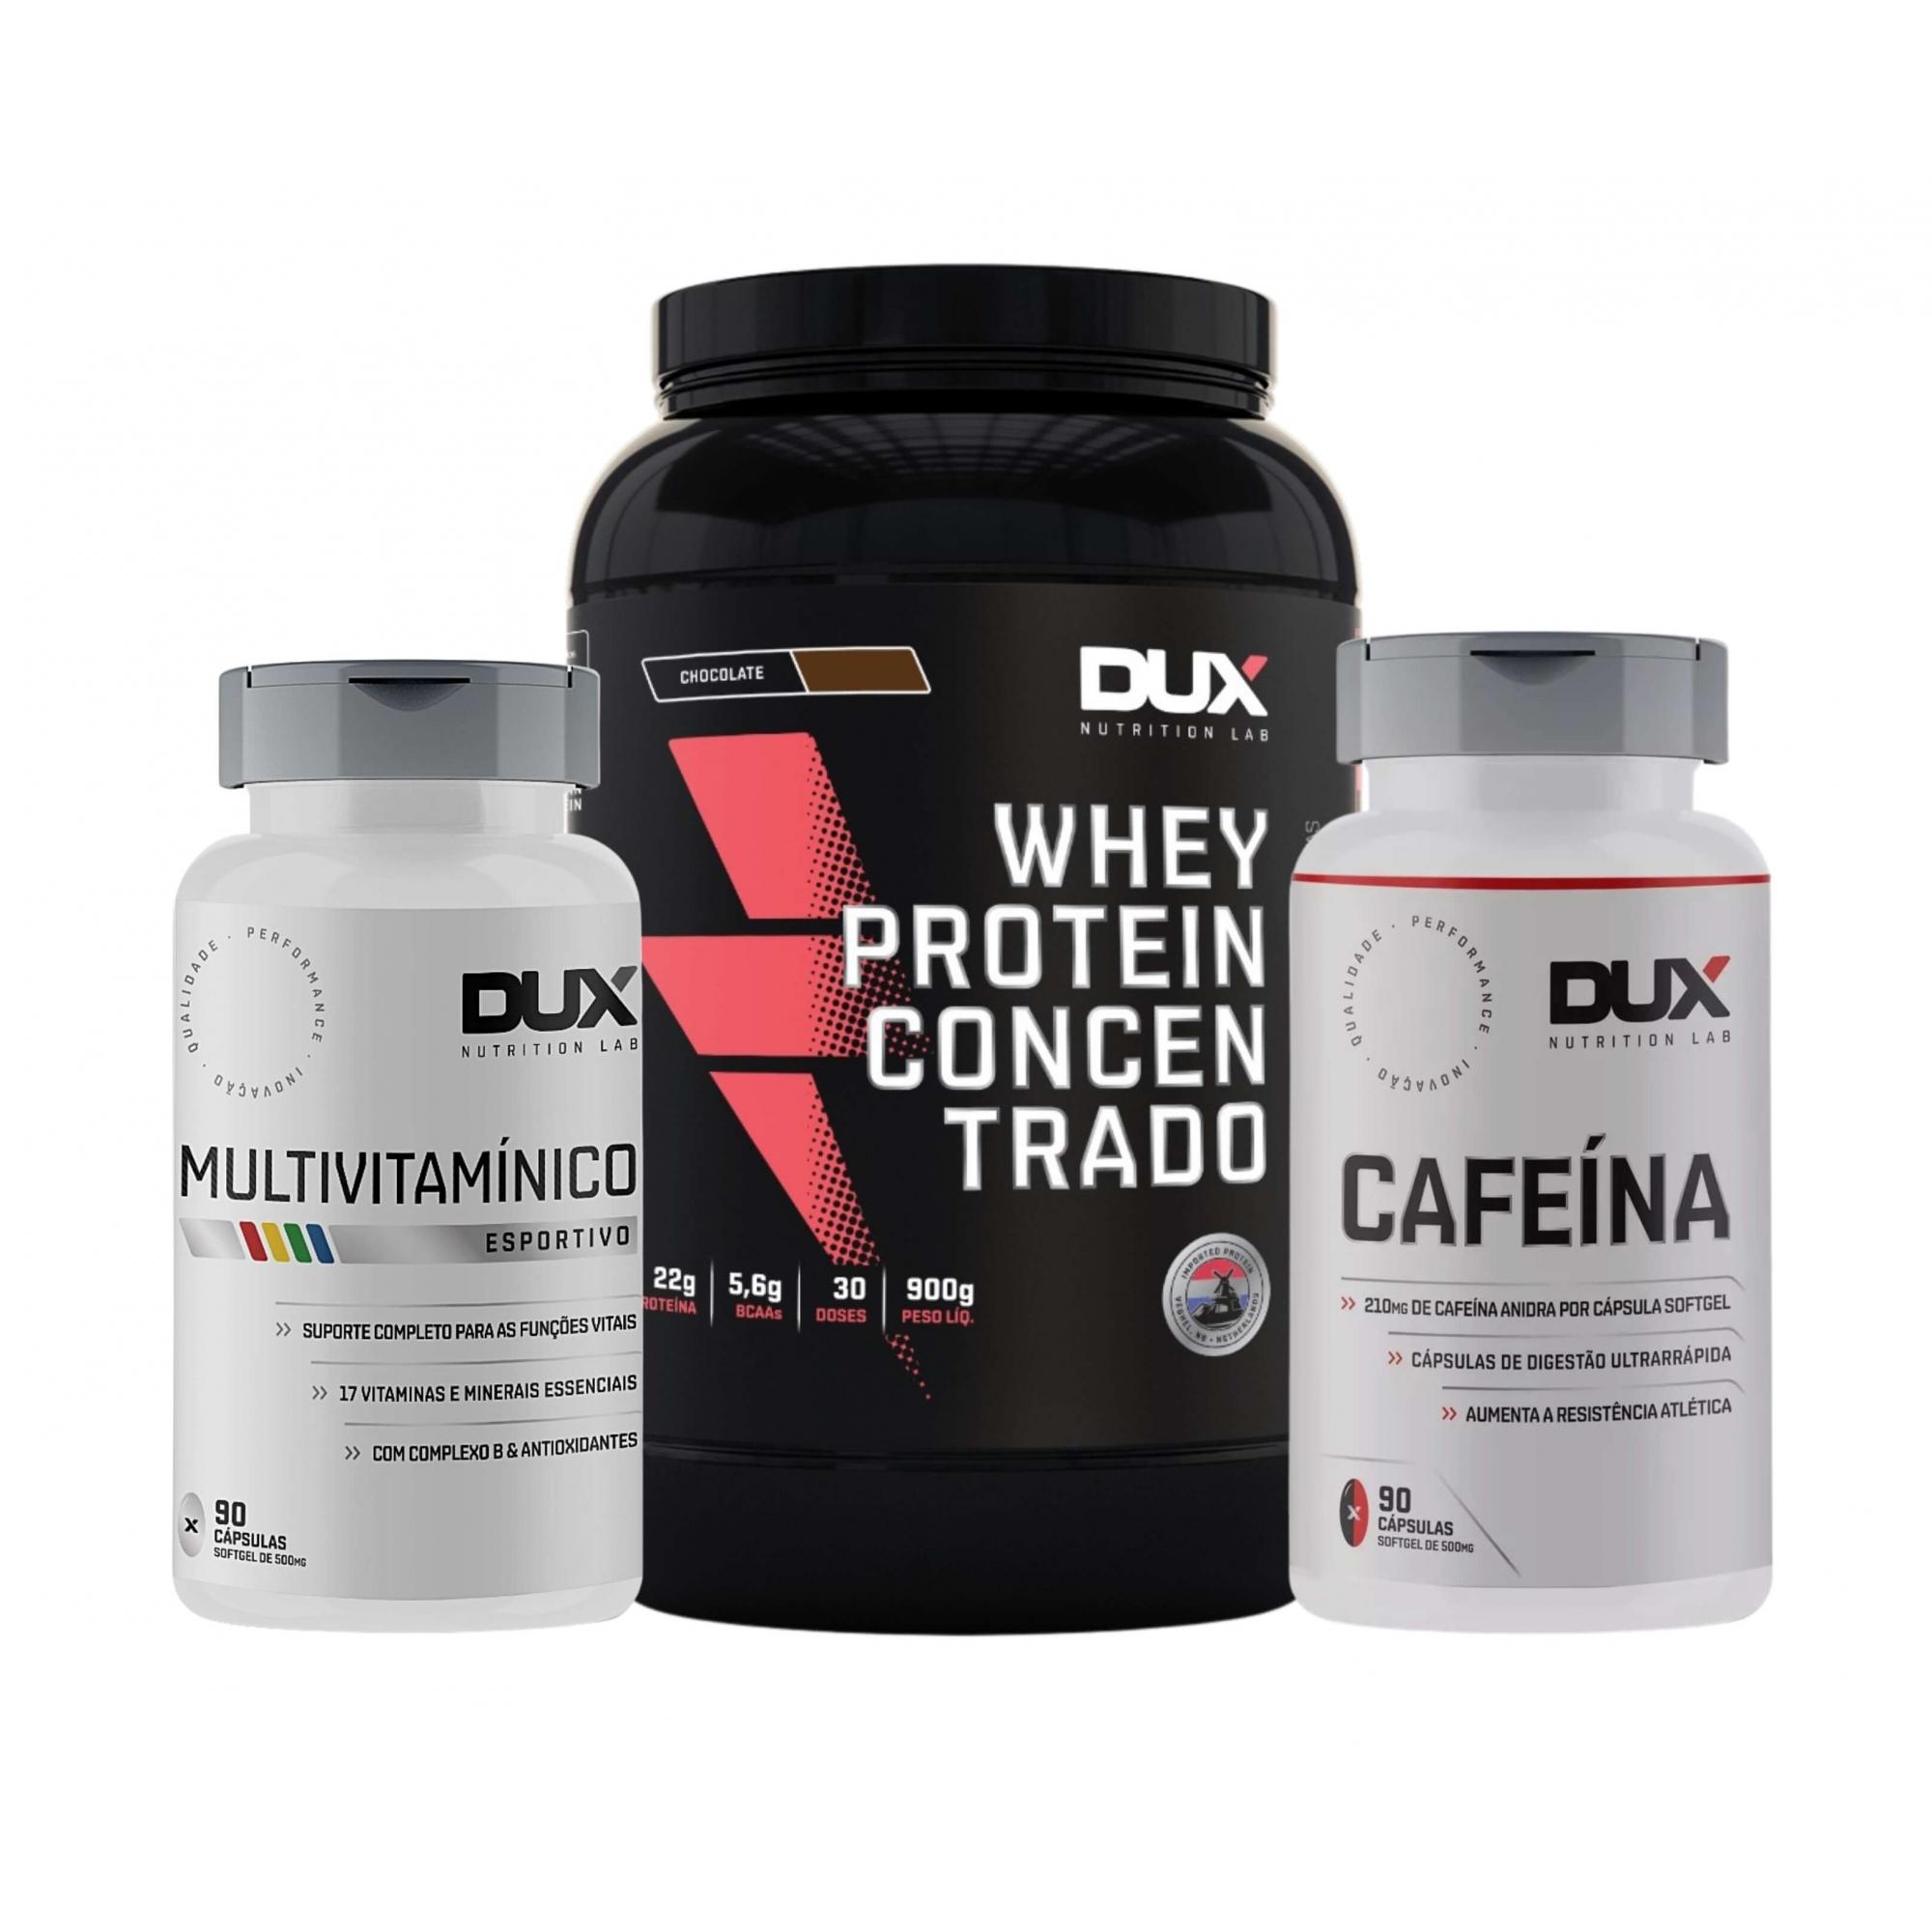 Whey Protein Concentrado 900g + Cafeína 90 caps + Multivitaminico 90 caps